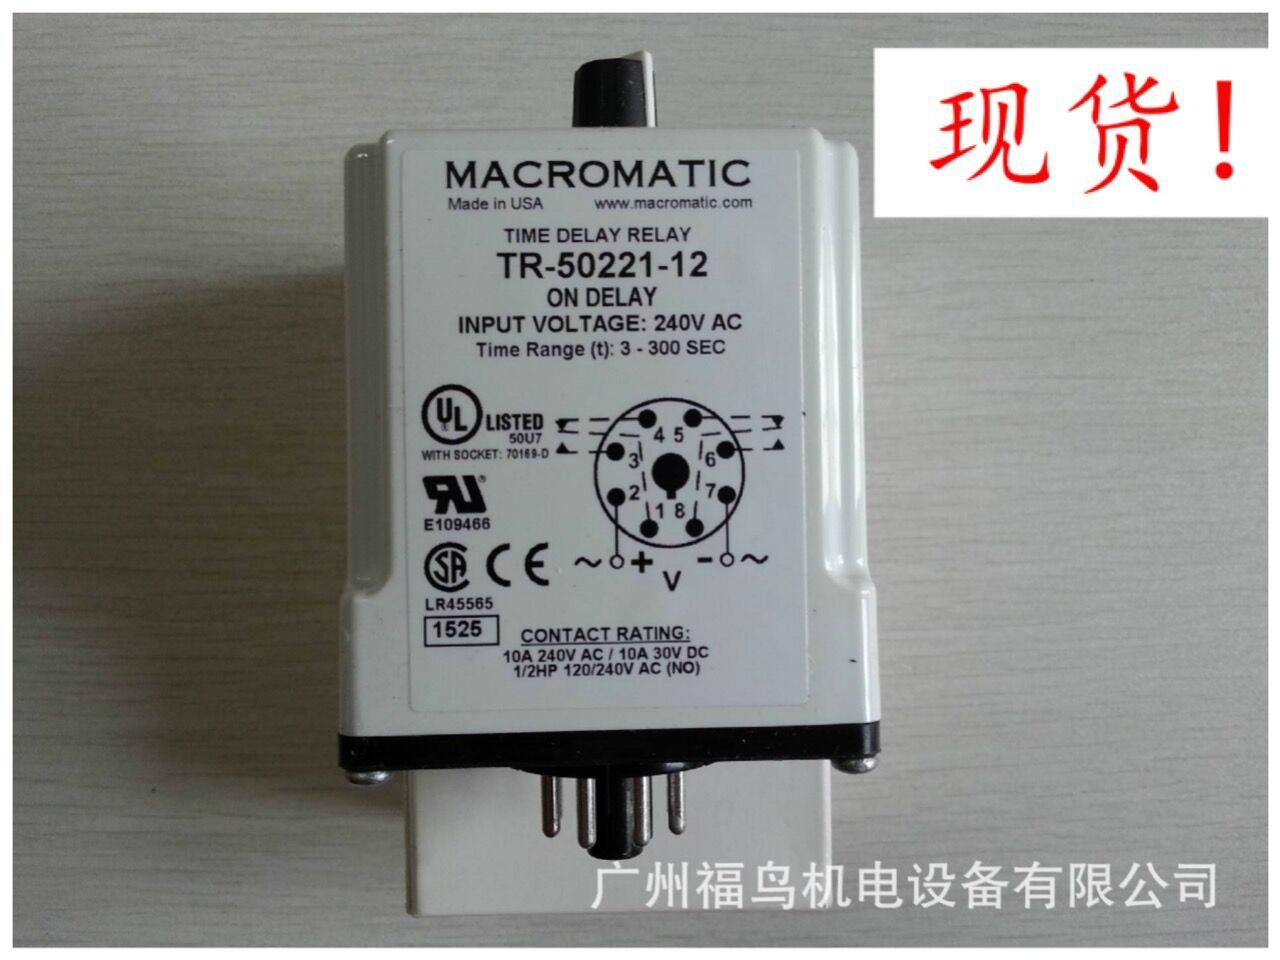 MACROMATIC延时继电器, 型号: TR-50221-12